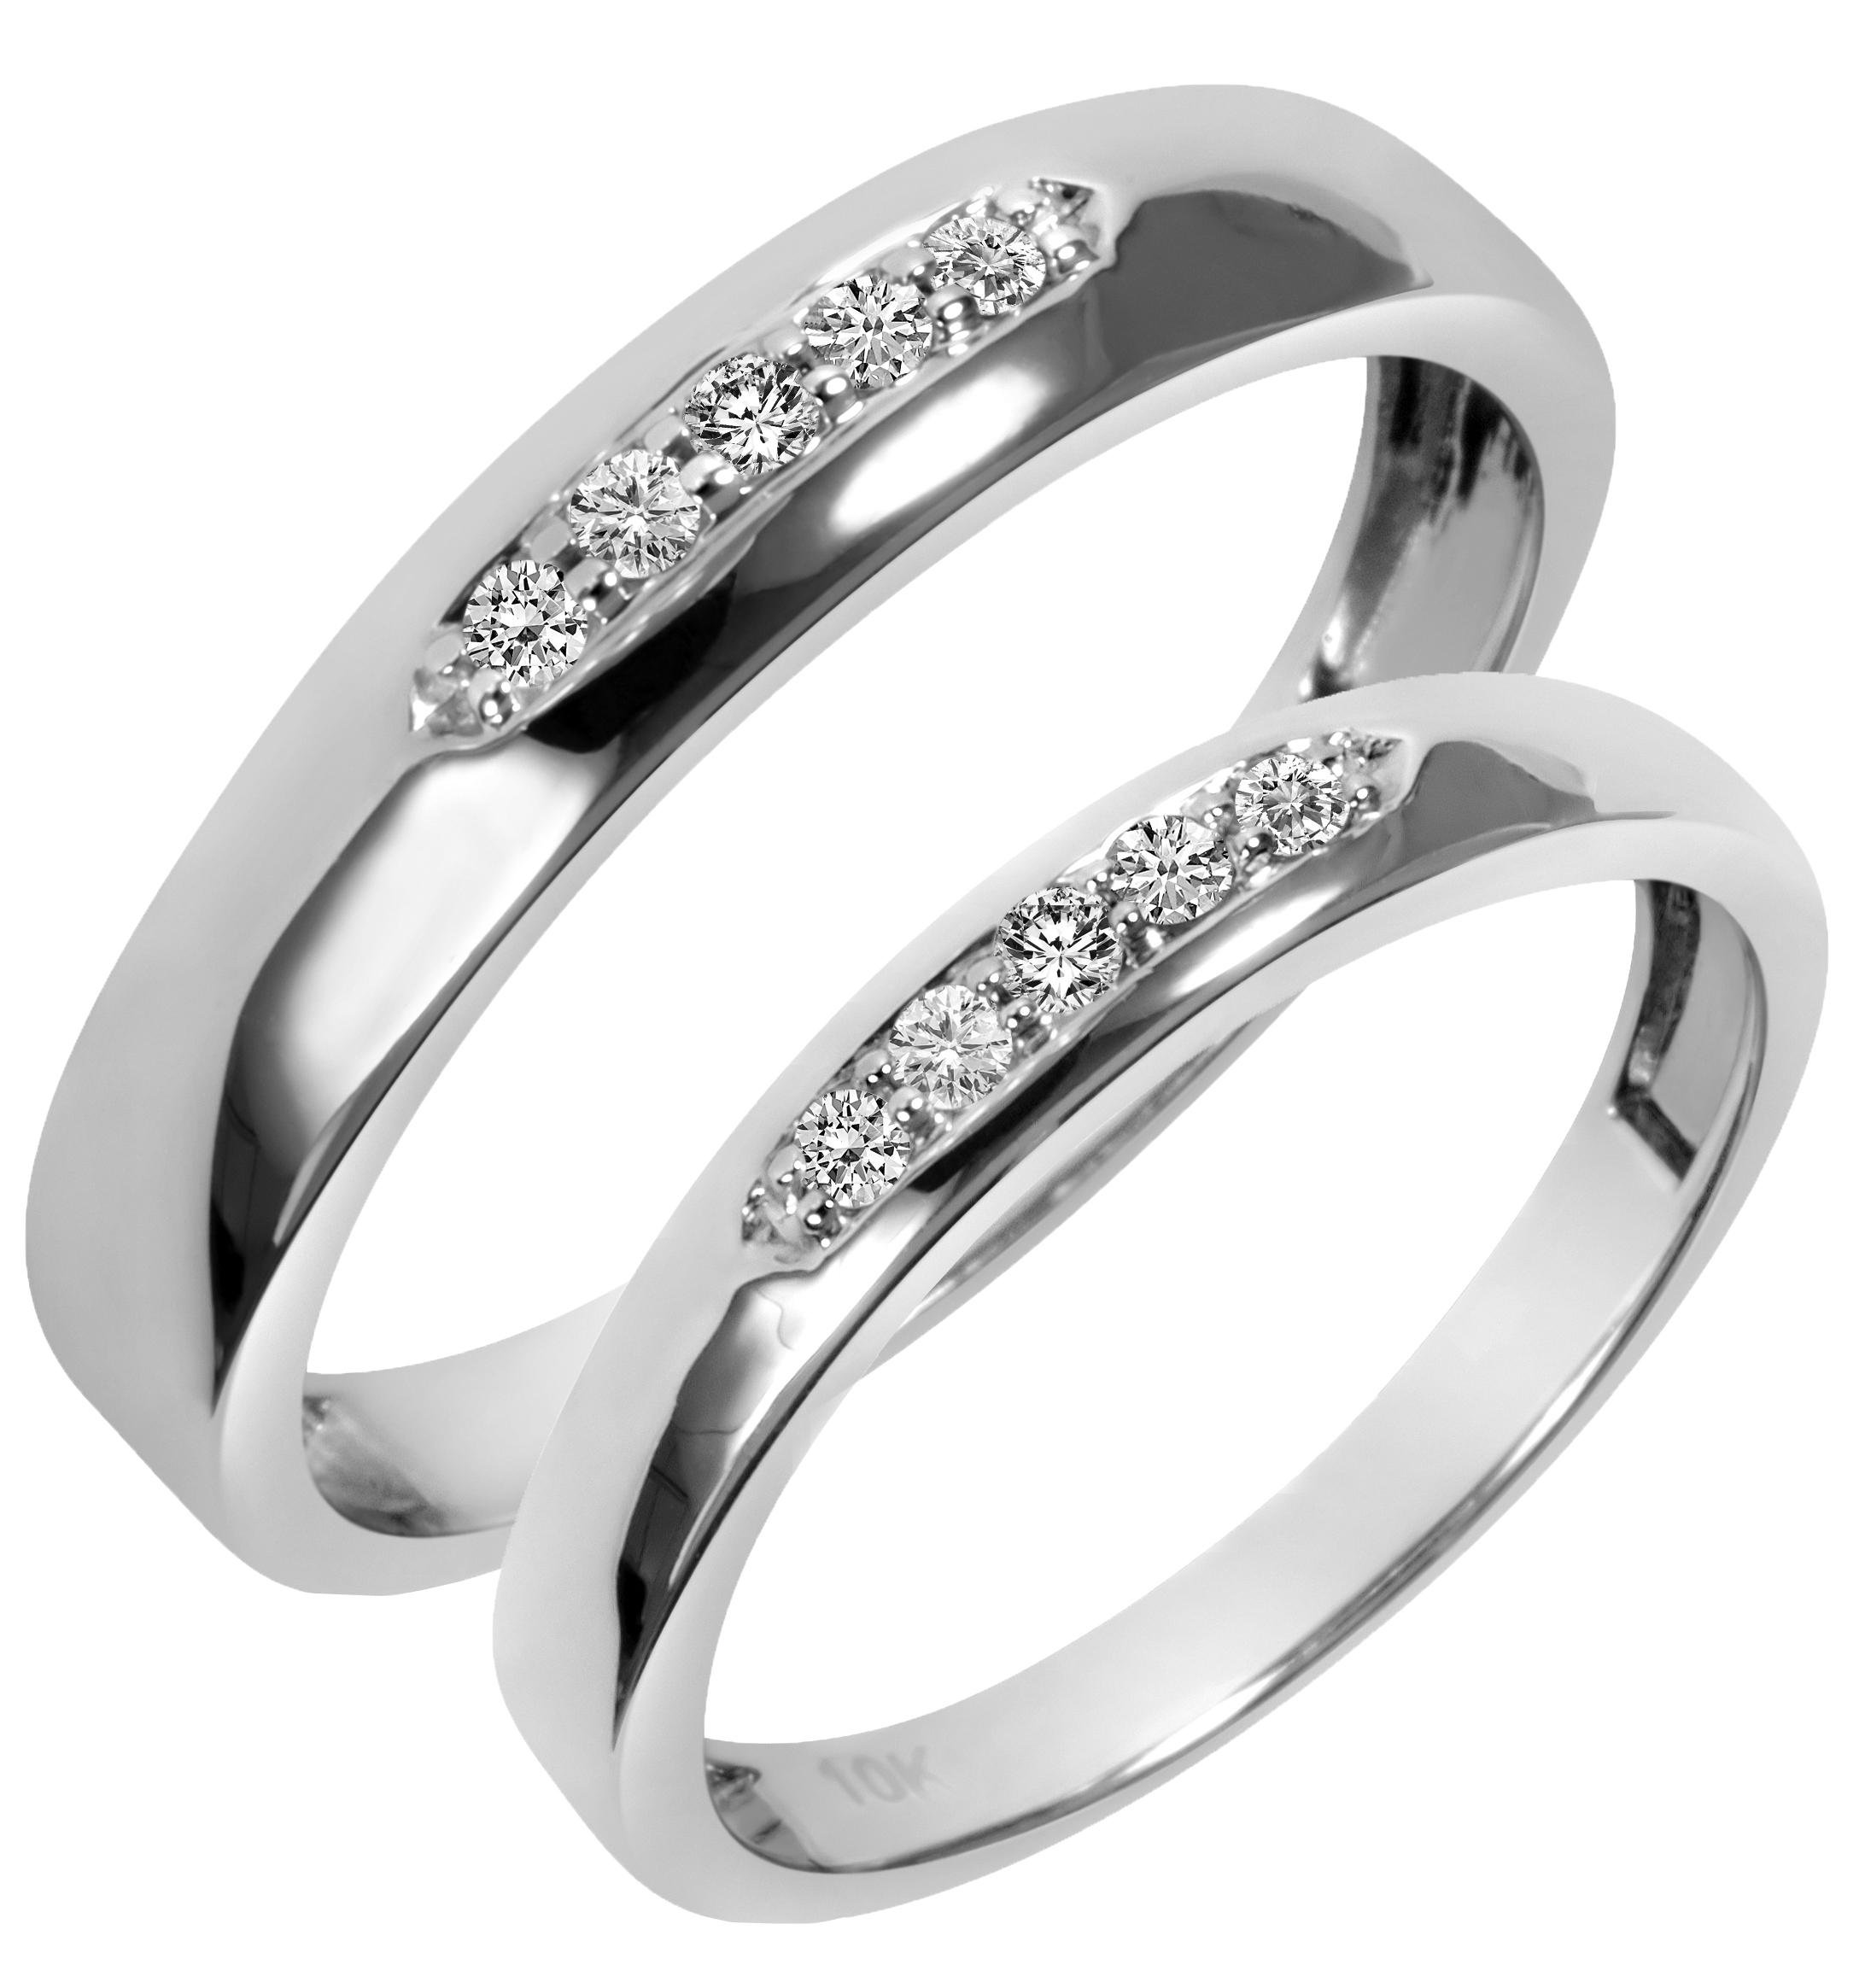 wedding band sets 1/5 carat t.w. diamond his and hers wedding band set 14k white gold | my aztvqdu